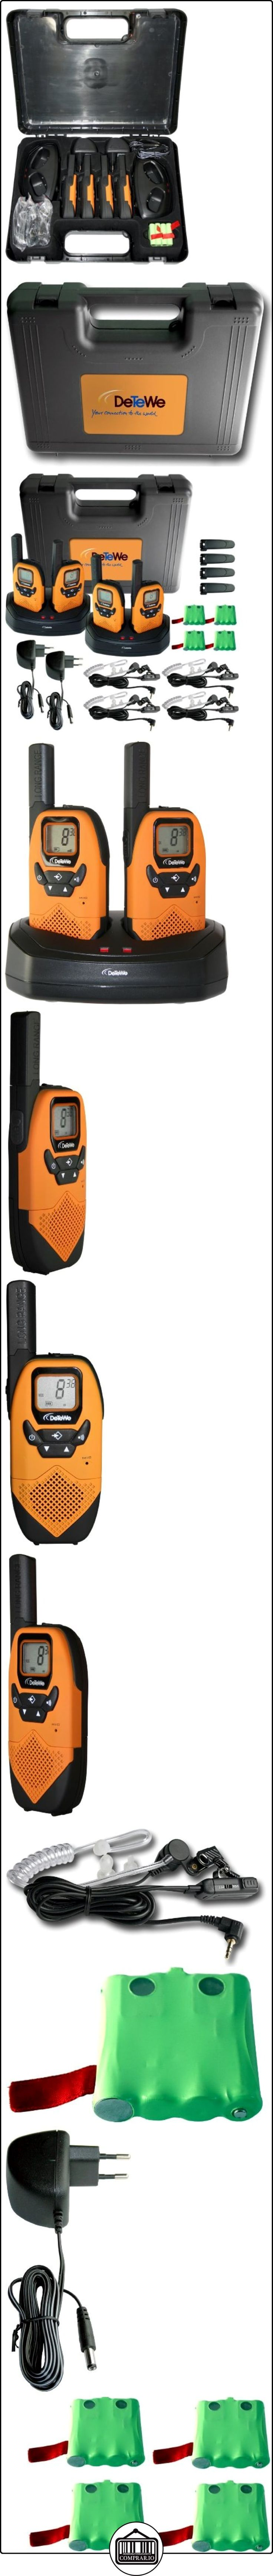 DeTeWe Outdoor 8000 Quad Case, LCD, 0.5 W, Power - Intercomunicador bebé  ✿ Vigilabebés - Seguridad ✿ ▬► Ver oferta: http://comprar.io/goto/B001CSPXQ0